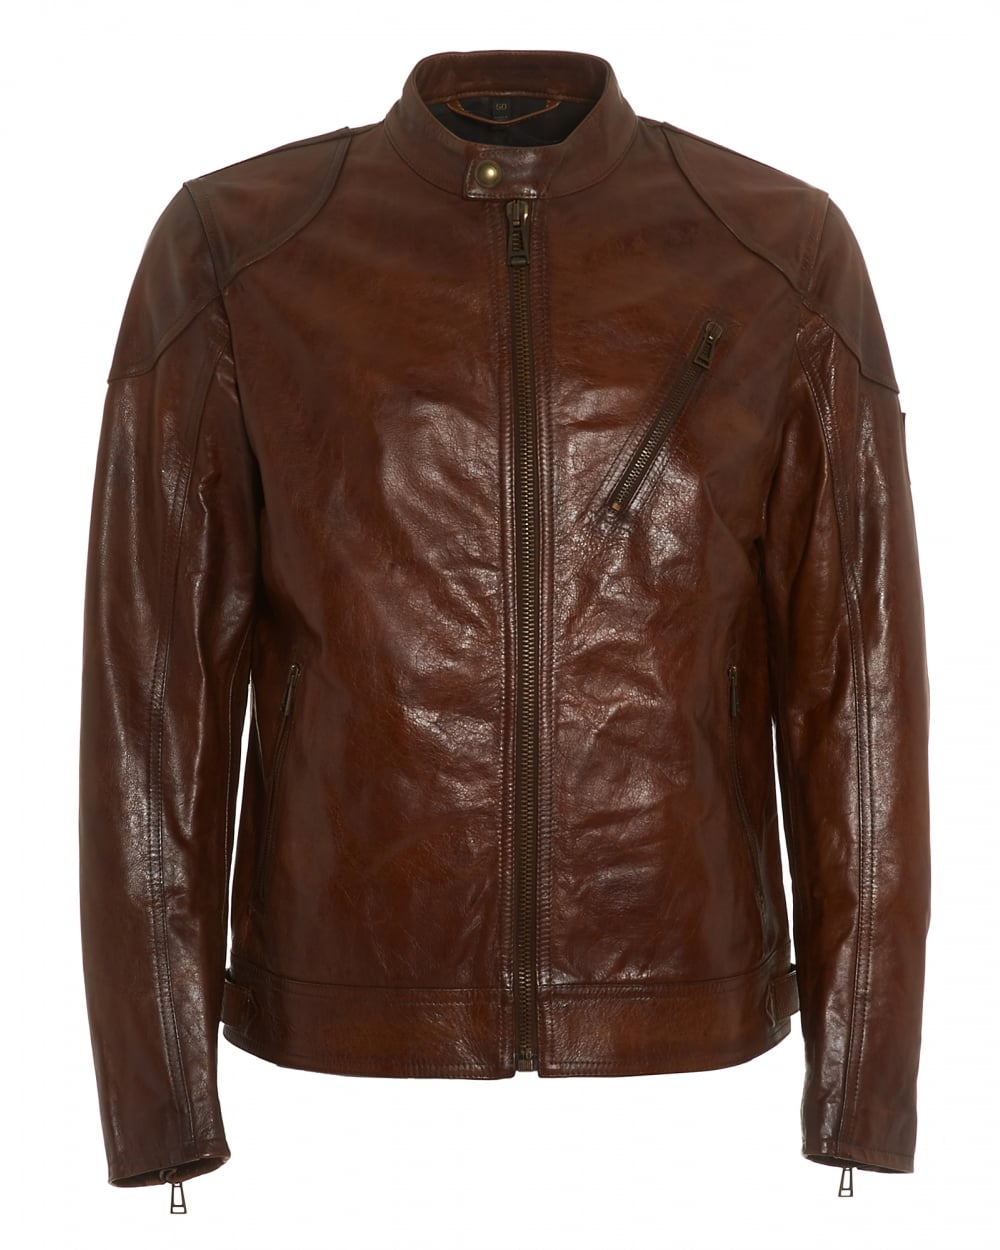 Best Supplier Sale Ebay Maxford 2.0 Leather Jacket Belstaff vSbEc57gL3